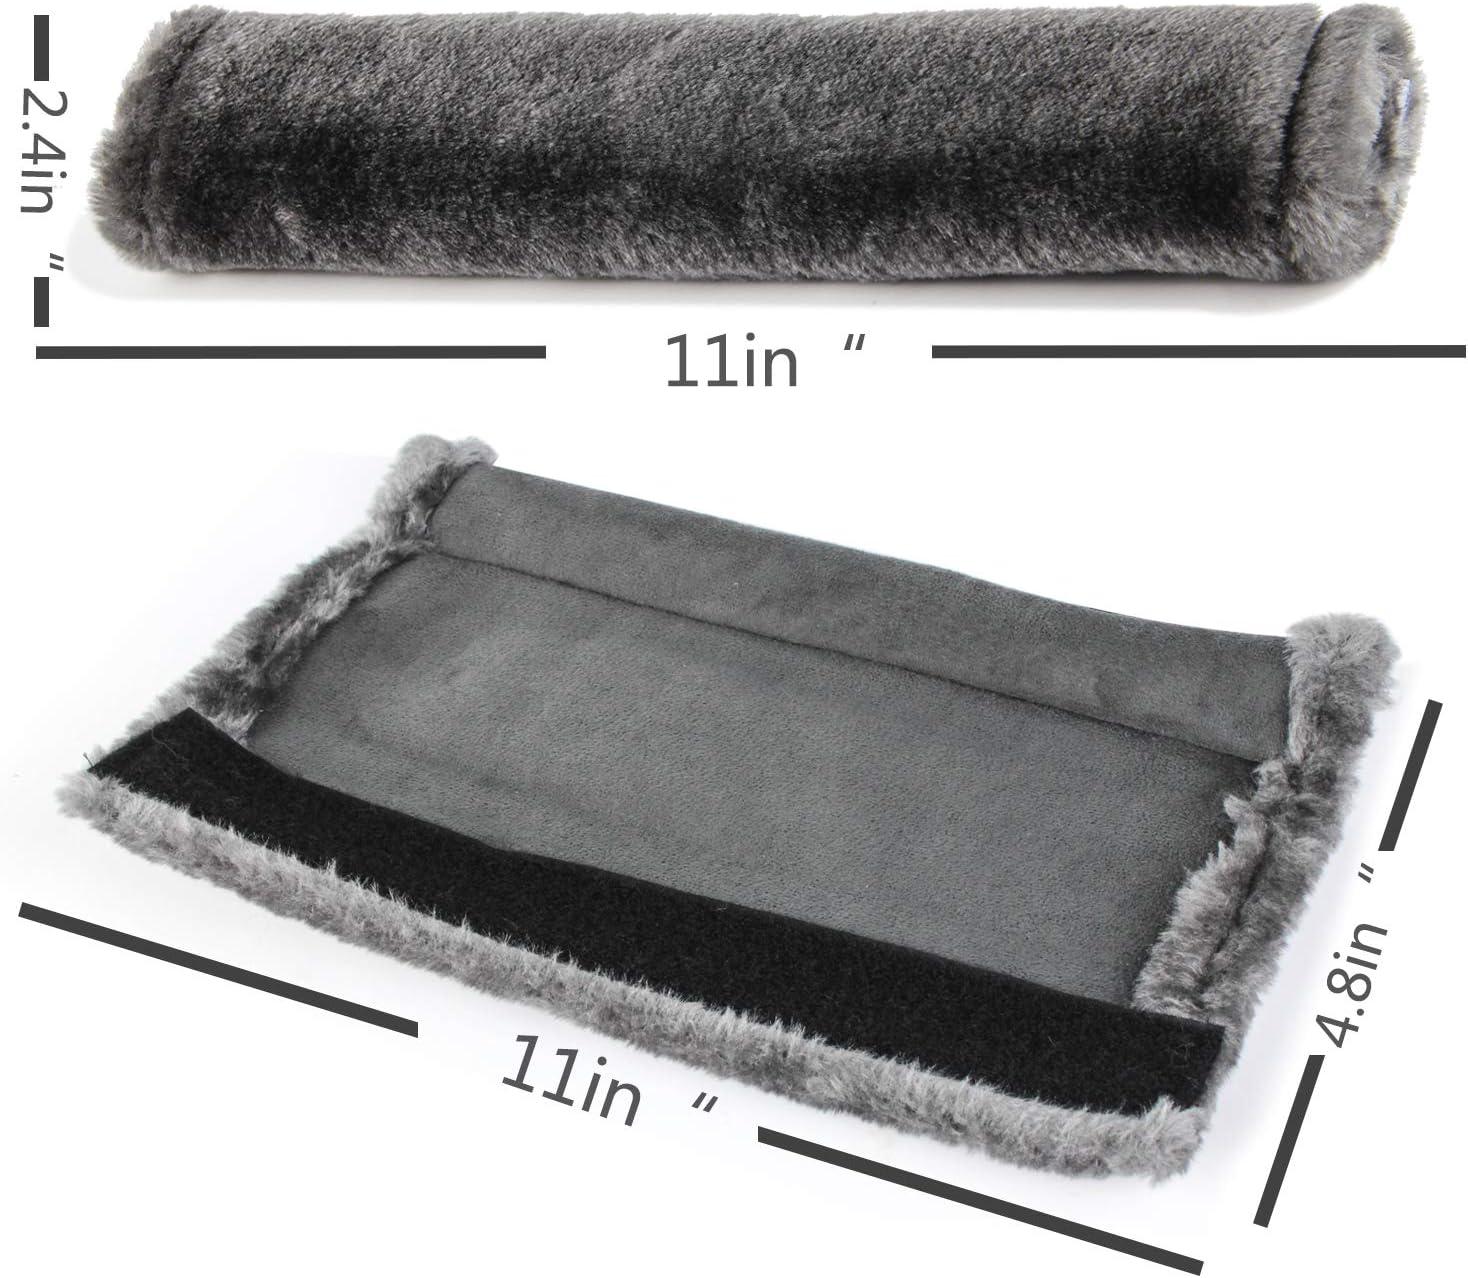 Soft Faux Sheepskin Wool Universal Seatbelt Cover for More Comfortable Driving,Multipurpose for Handbag Carmera Backpack Straps,4pc(Black) Moonet Auto Seat Belt Shoulder Pad